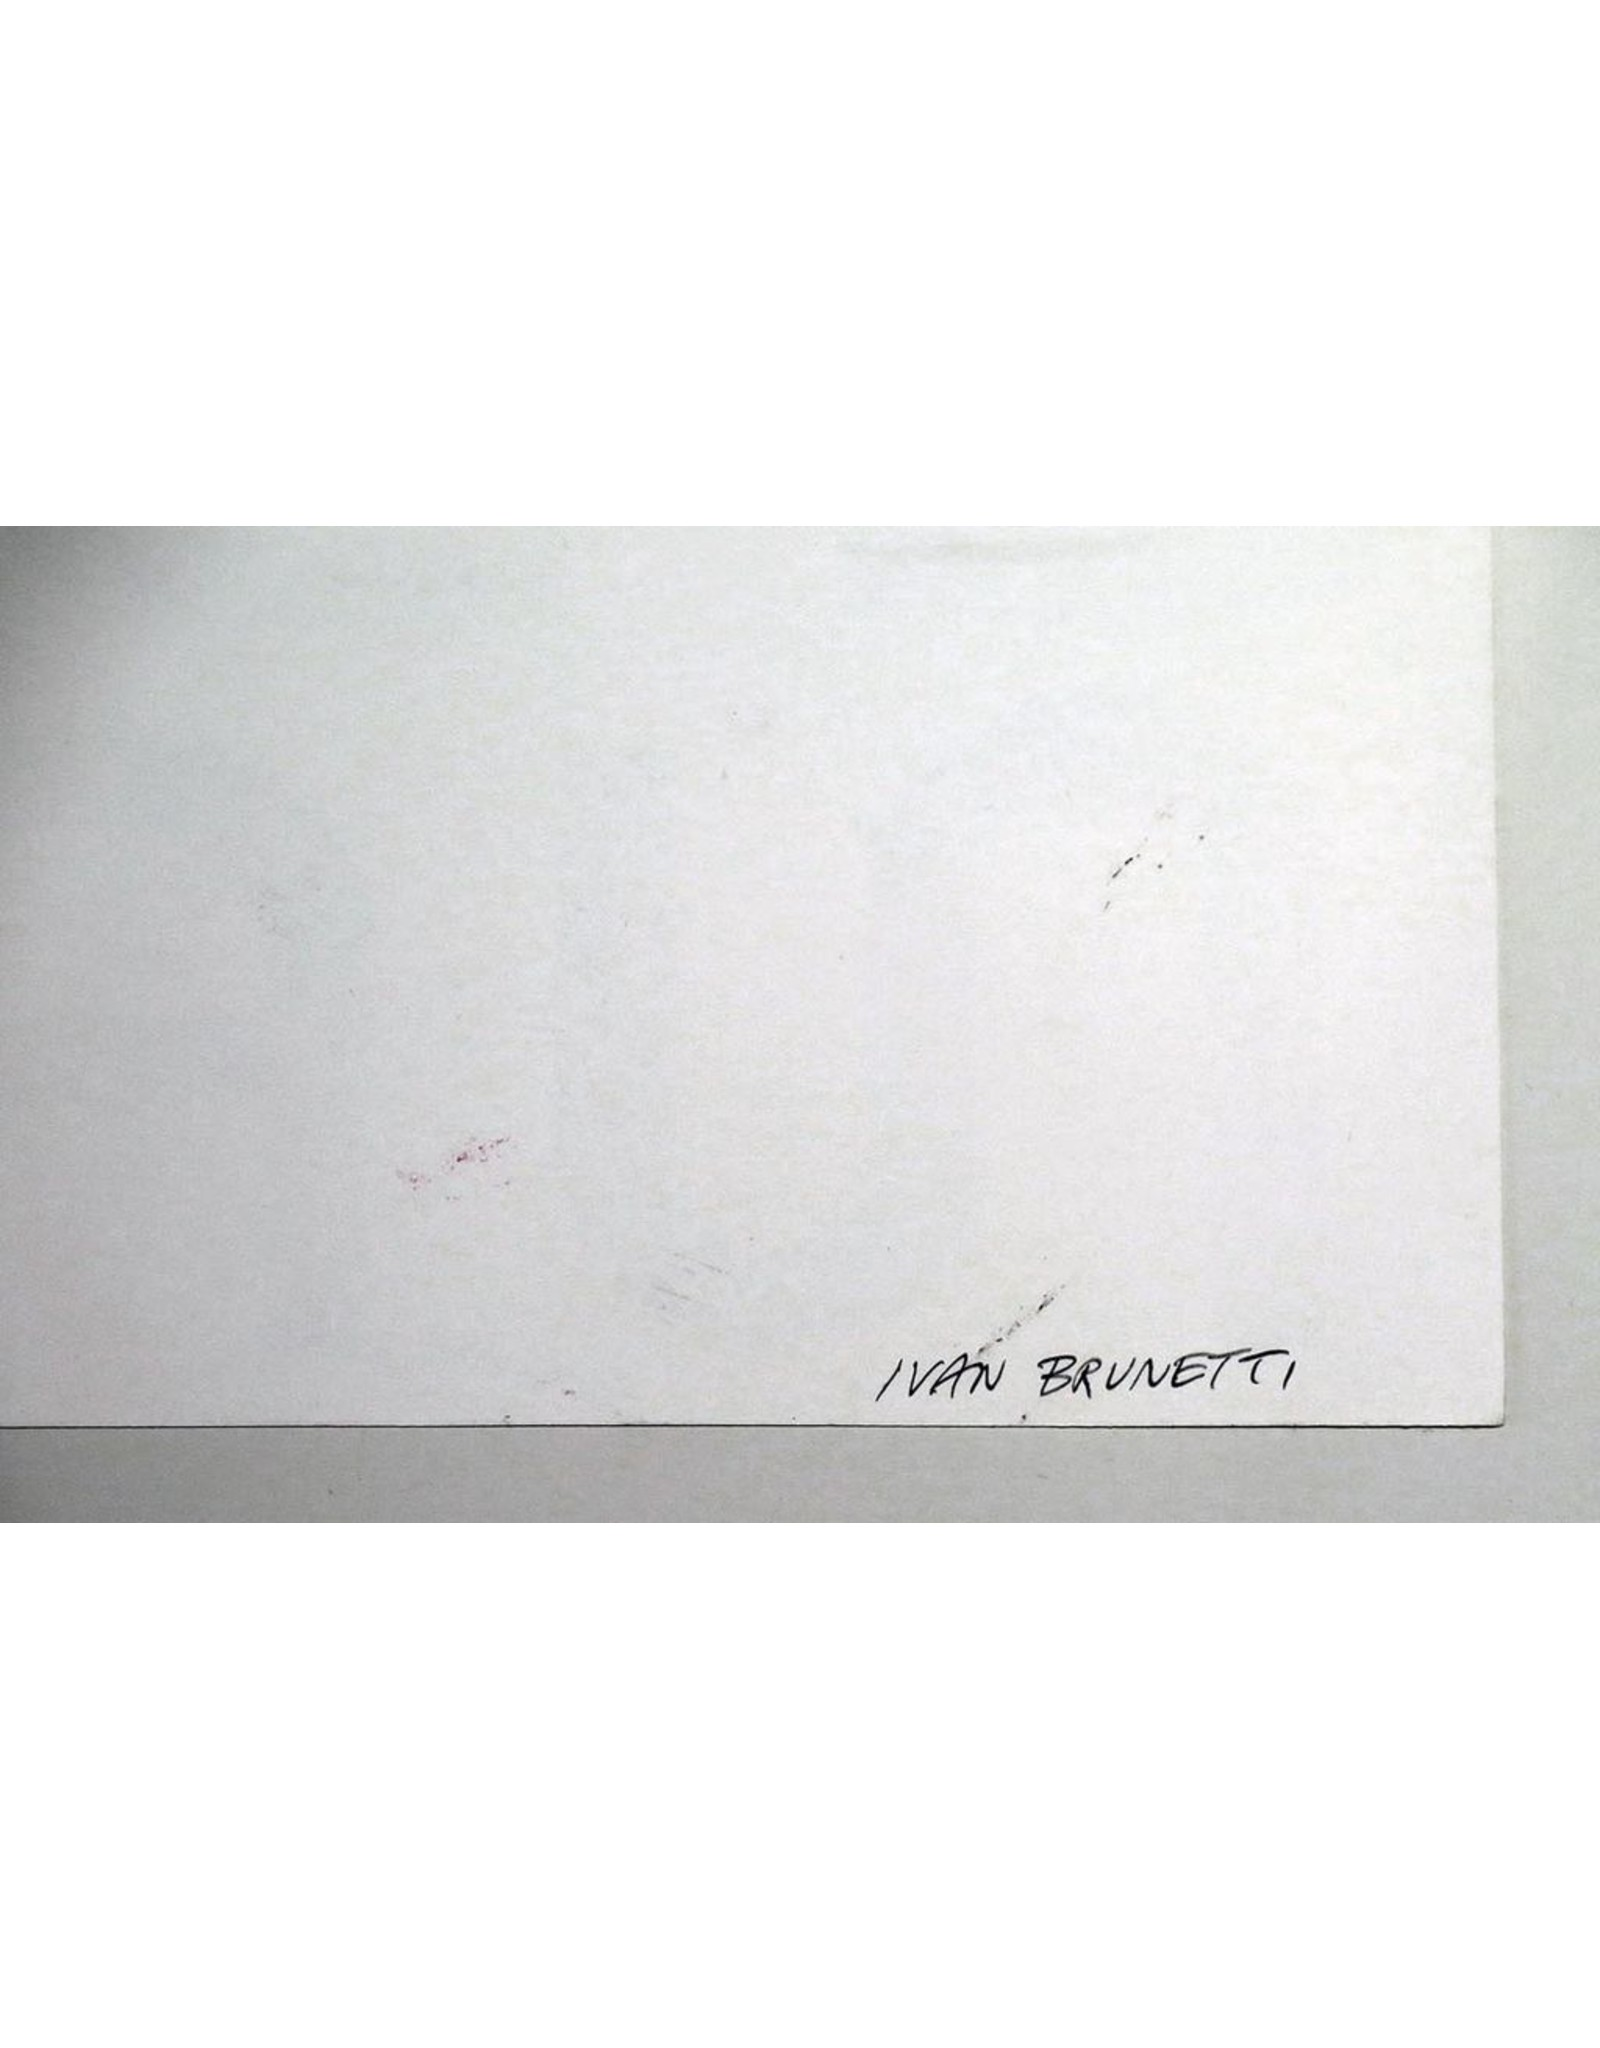 Ivan Brunetti Smoke Signal Title Lettering, 2014, Illustration by Ivan Brunetti